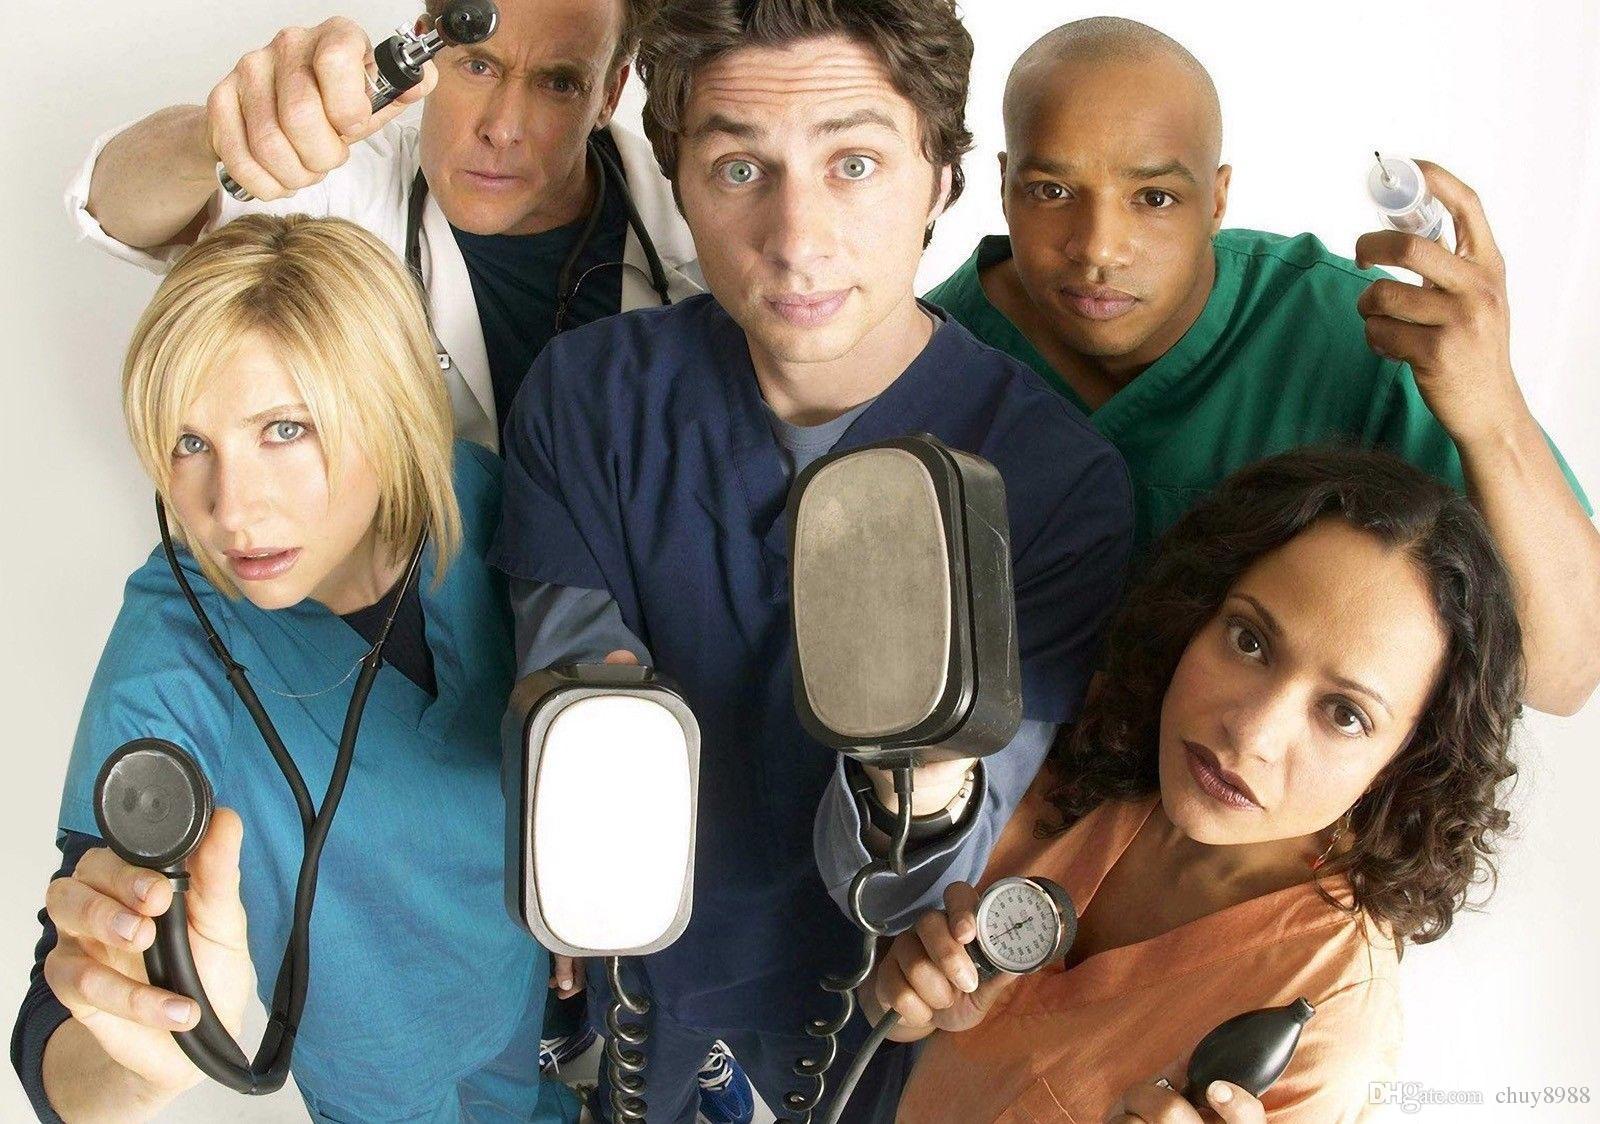 Scrubs tv show cast think, that